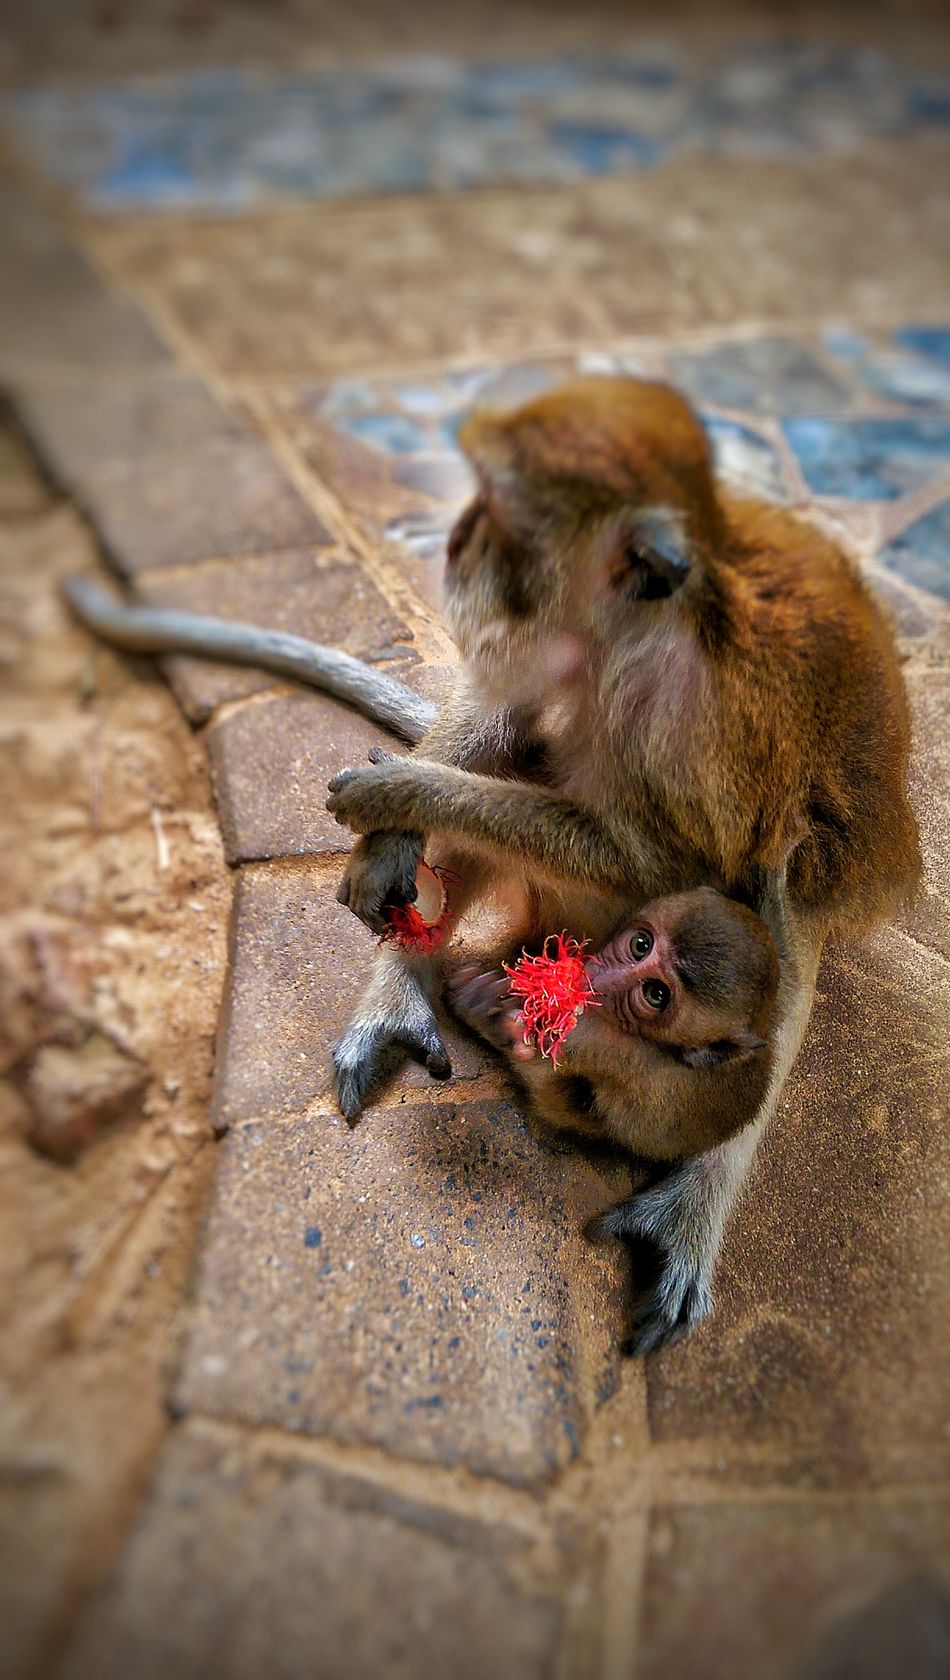 Mother Feeding  Baby Monkey Rambutan Fruit Thaifruits Motherlove Beautiful Animal Wildlife & Nature Thailand Railay Beach WILD MONKEYS Nationalgeographic Natgeowild EyeEm Gallery EyeEm Nature Lover EyeEm Best Shots EyeEm Best Shots - Nature